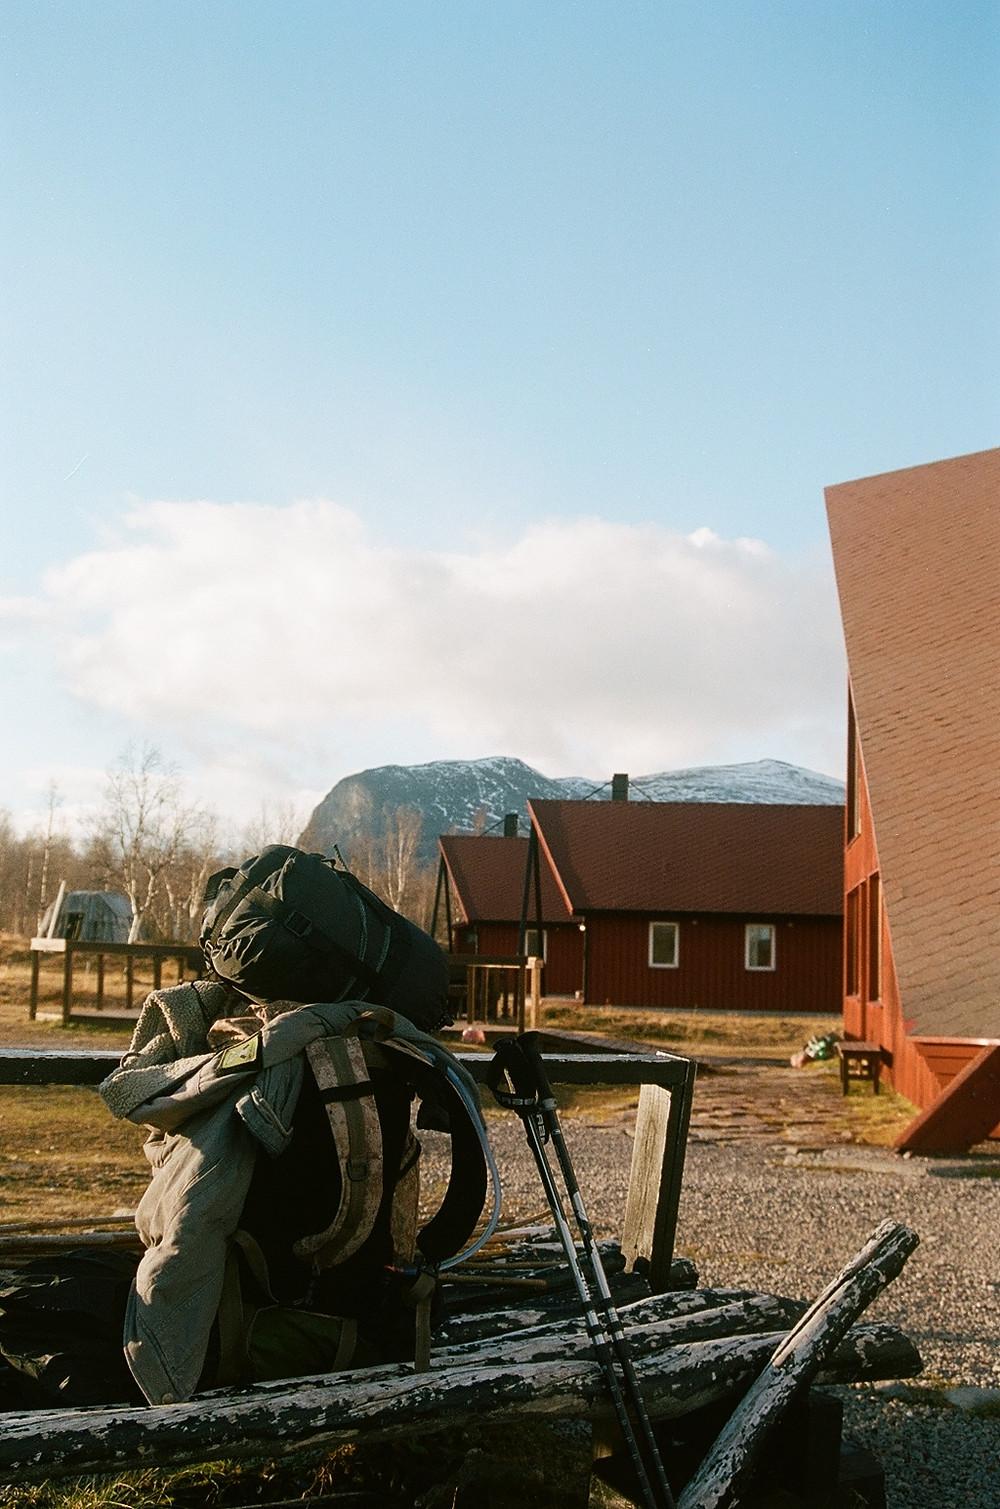 In Nikkaluokta, looking back. Shot on Kodak Portra 400.